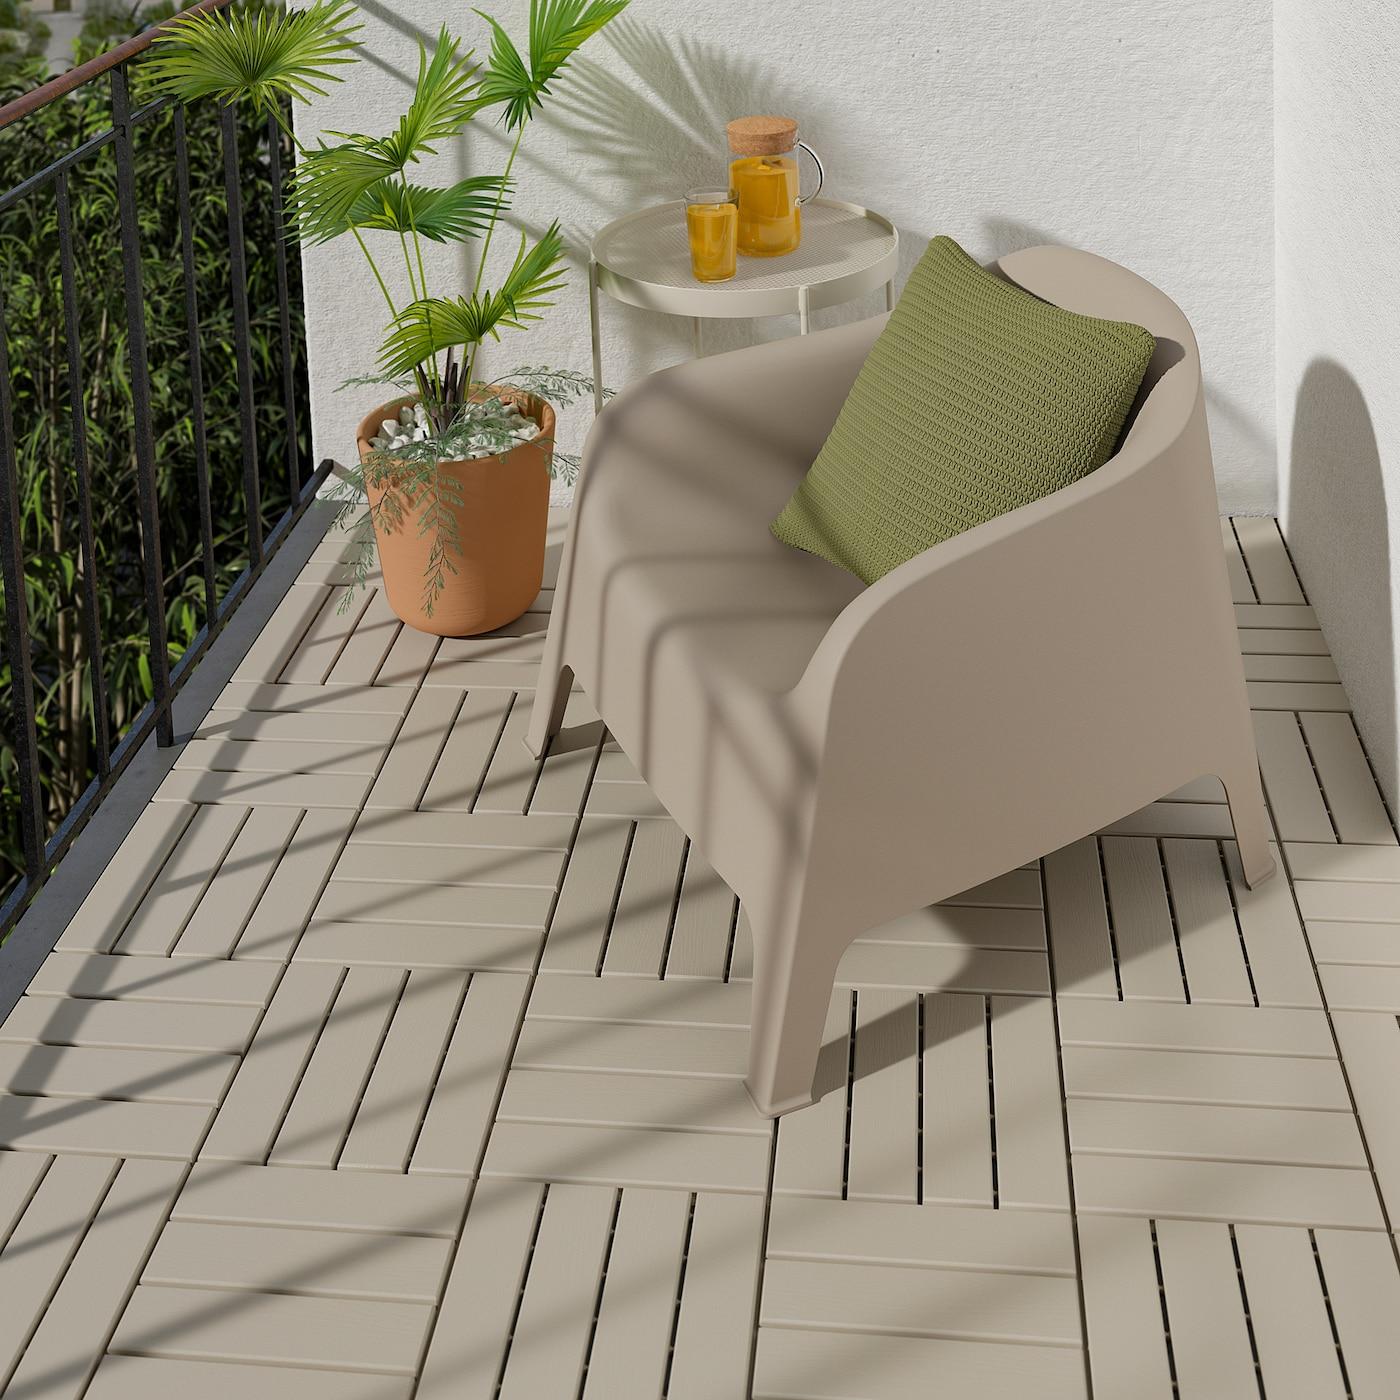 Ikea RUNNEN Decking, outdoor, beige9 sq feet (0.81 m²)